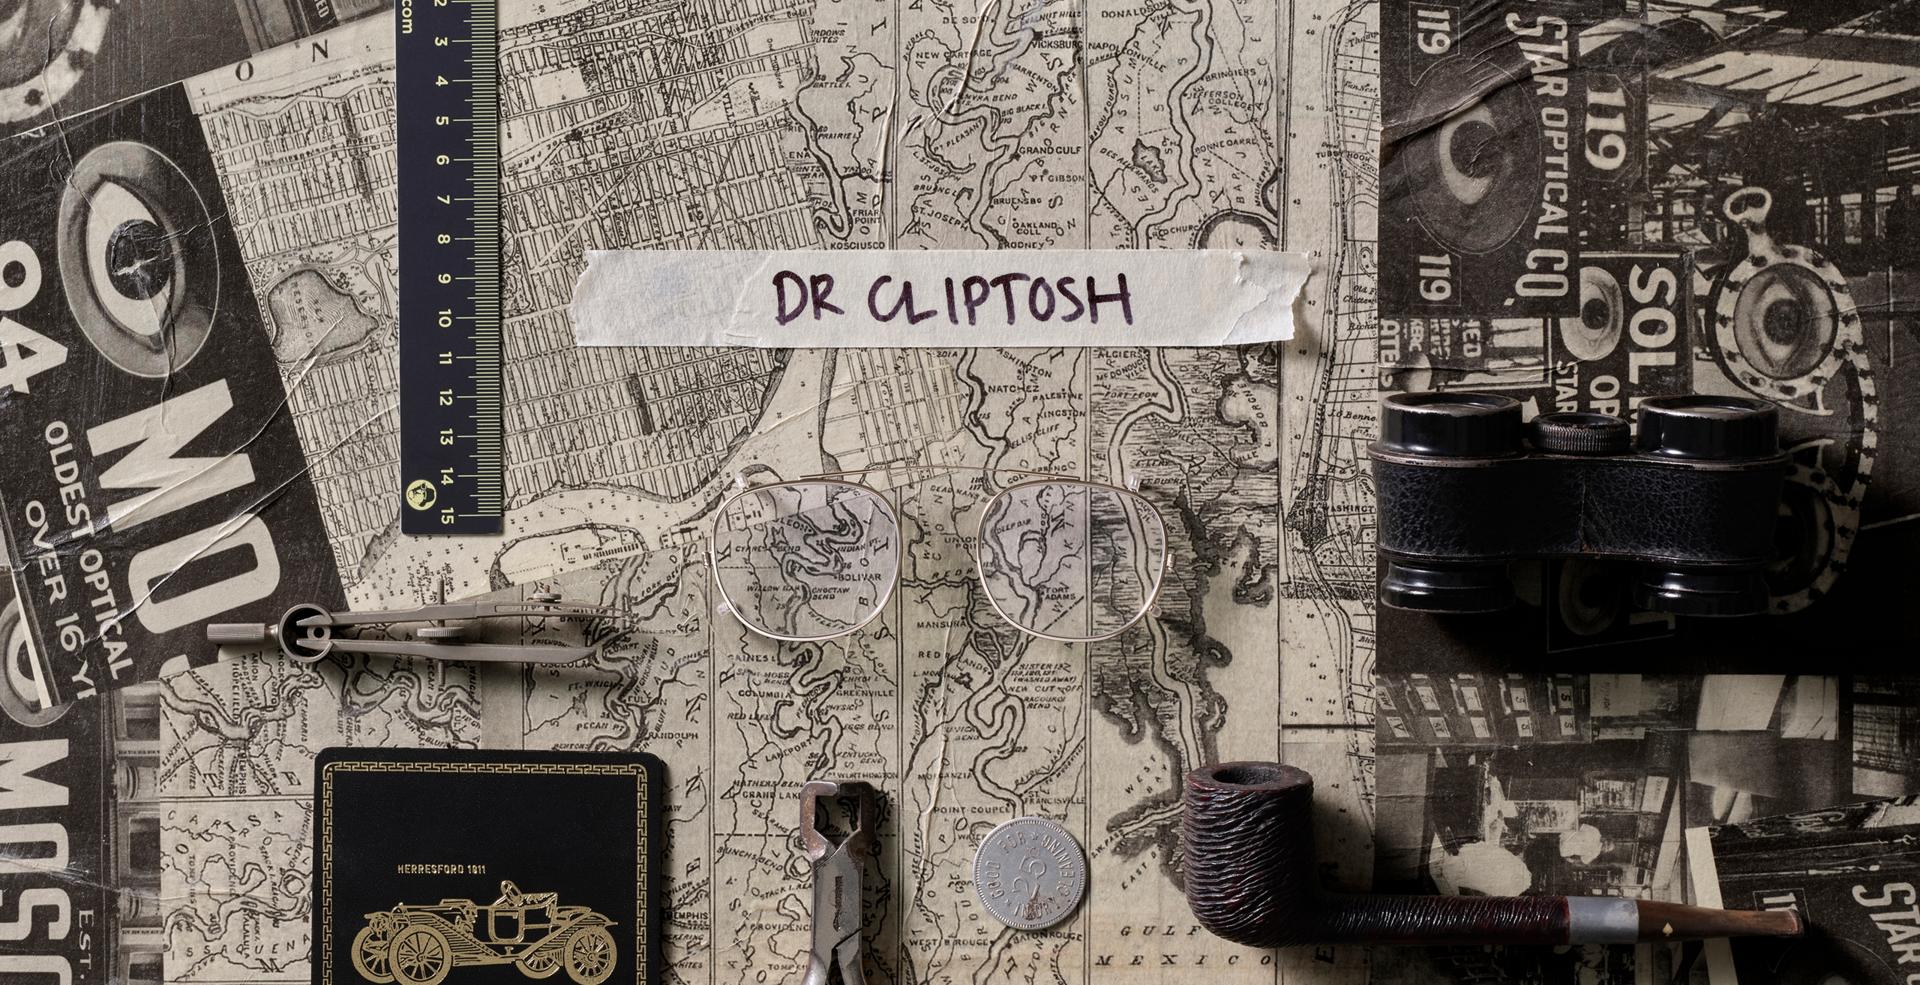 DR CLIPTOSH